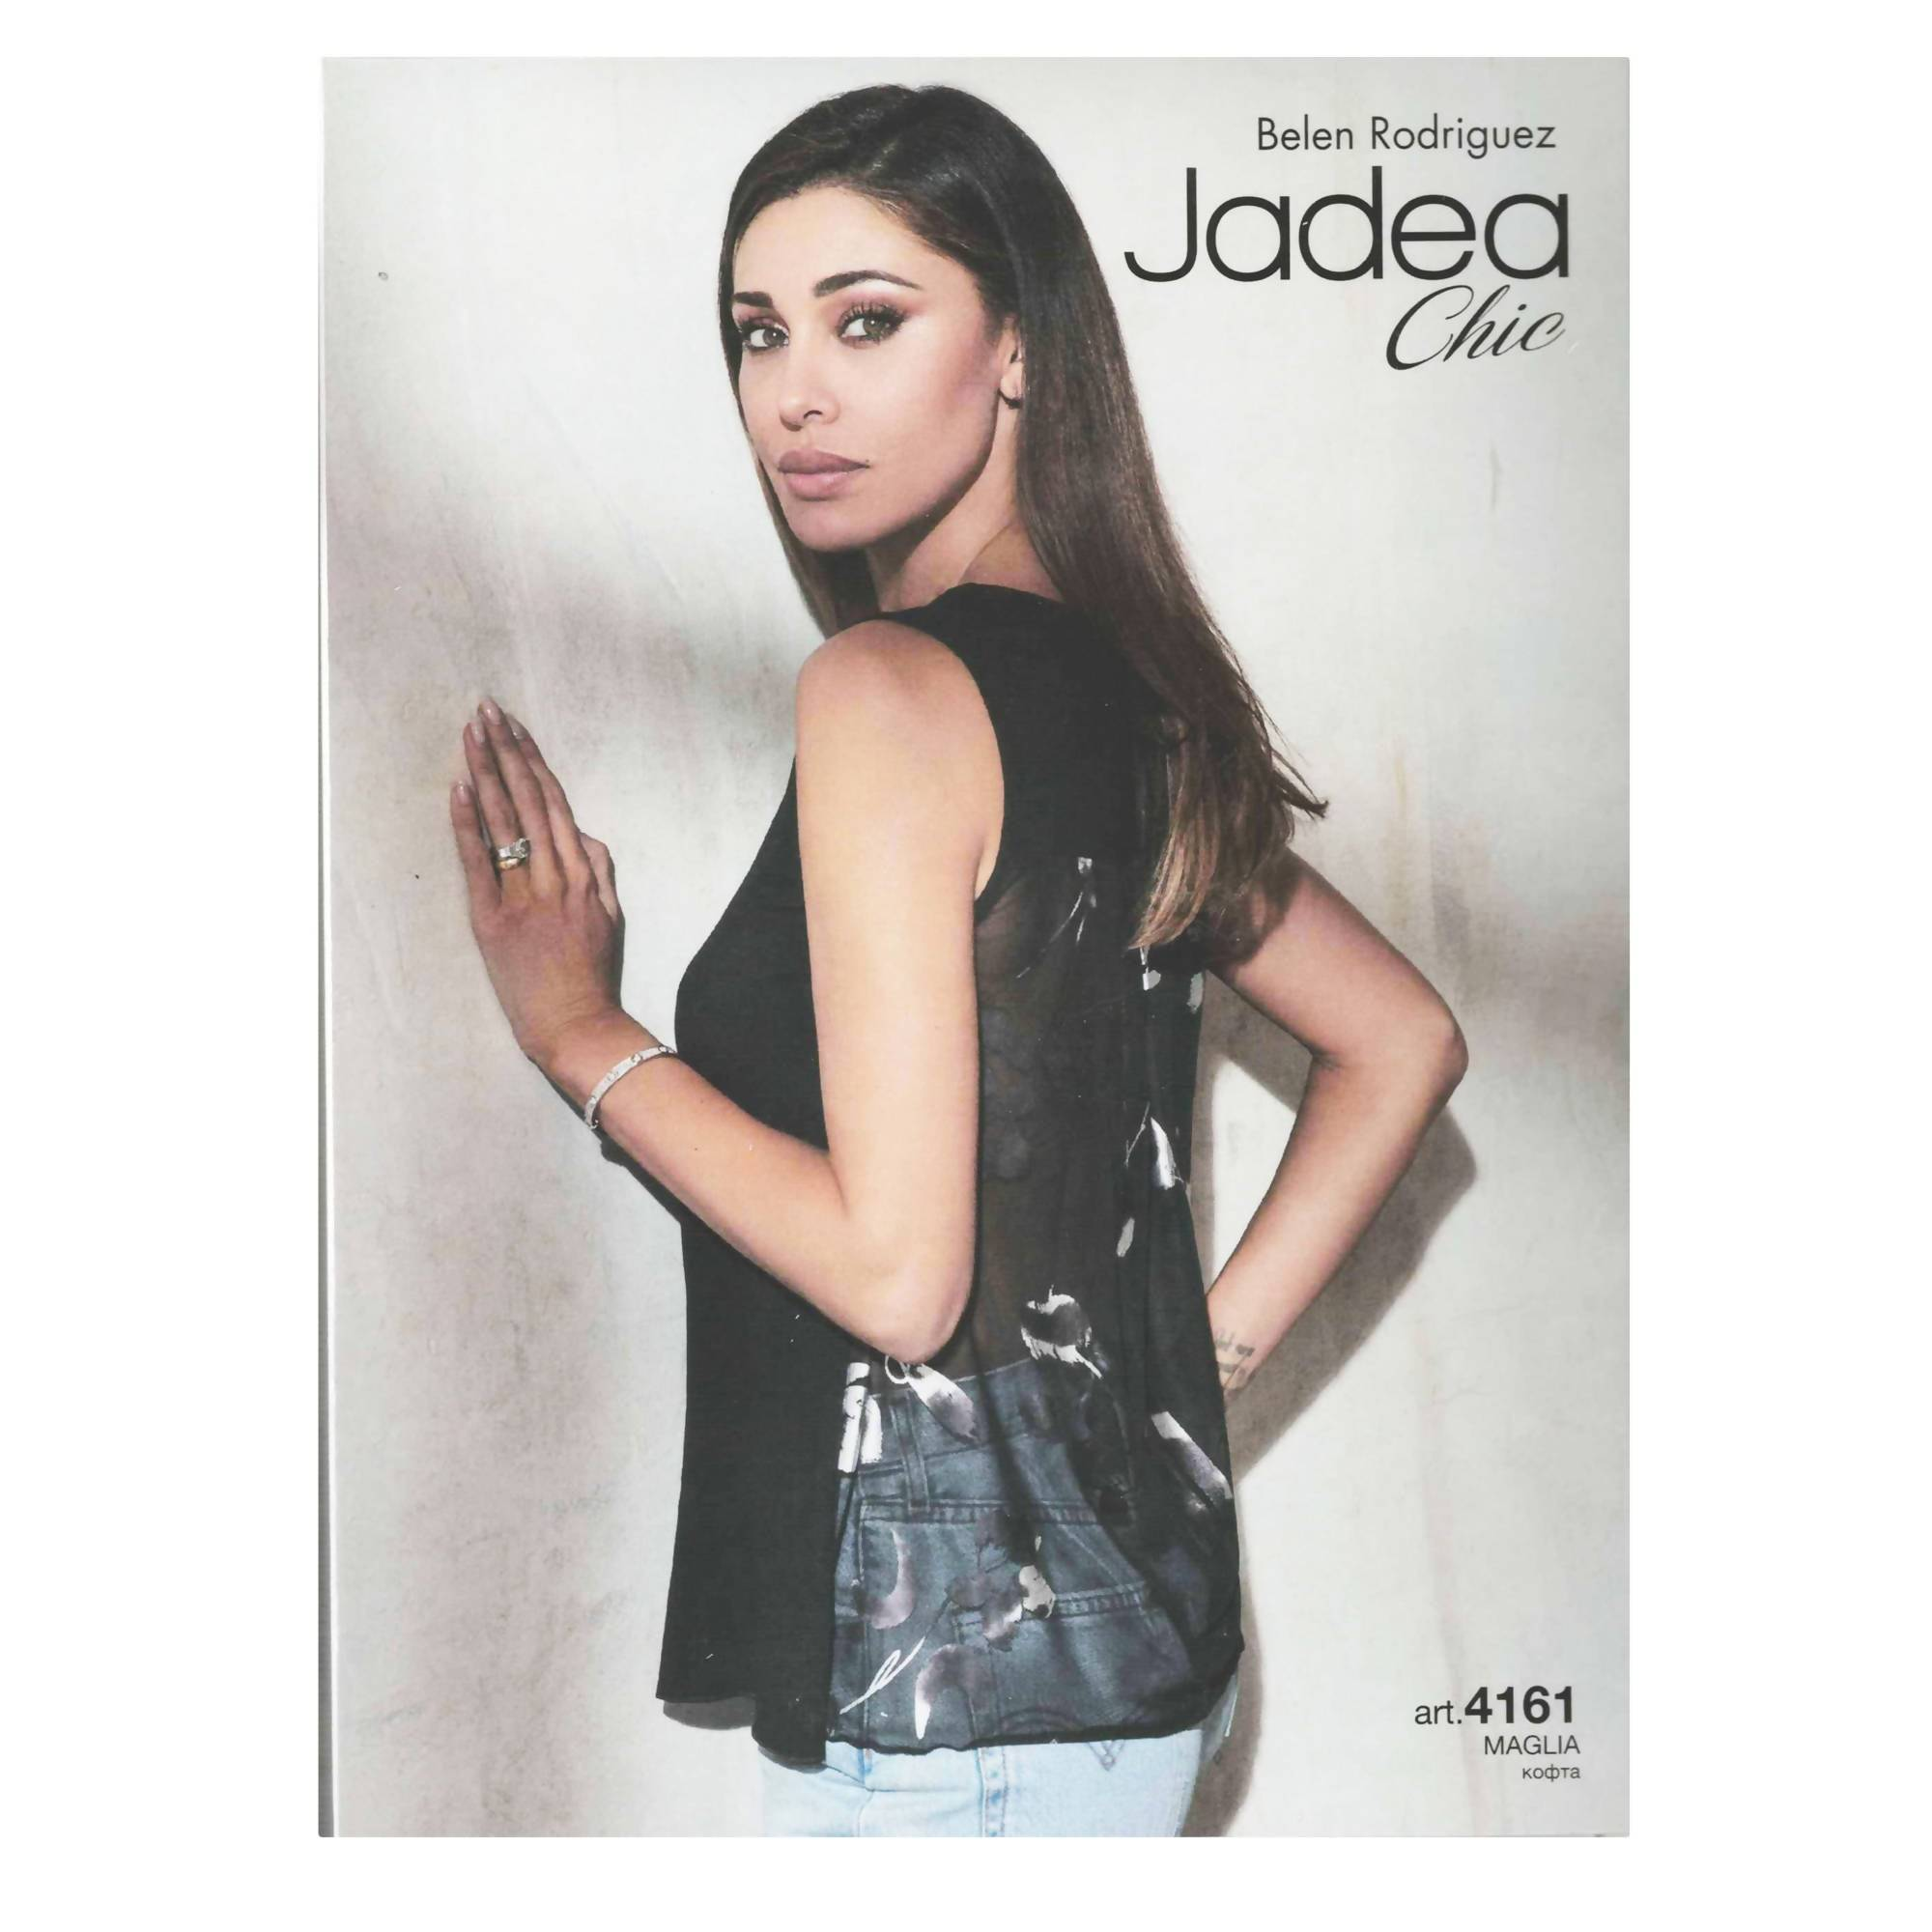 jadea art. 4161 jadea chic top canotta spalla larga nera made in italy maglia estiva semi trasparente canottiera art. 4161